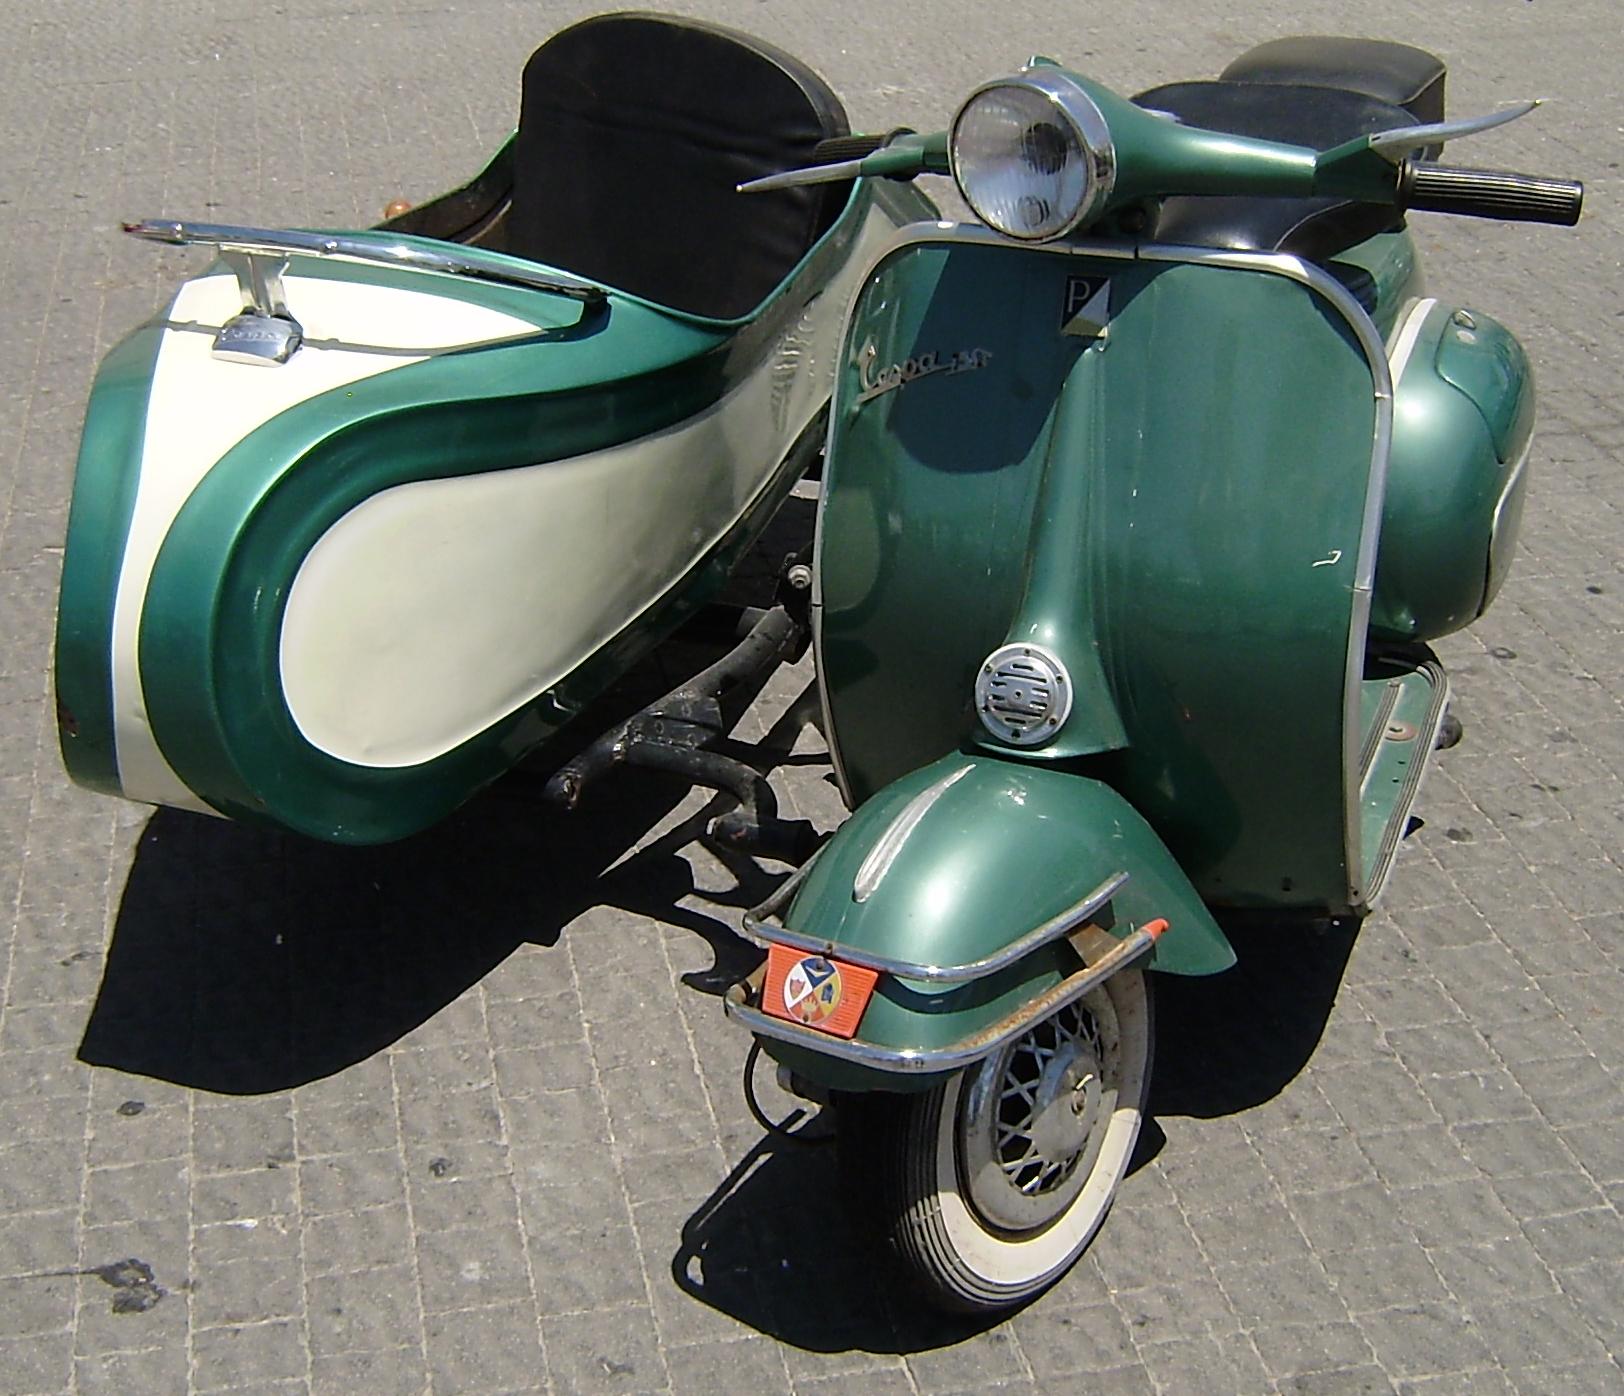 Motorcycle Side Cars Carpys Cafe Racers 1962 650 Yamaha Wiring Diagram